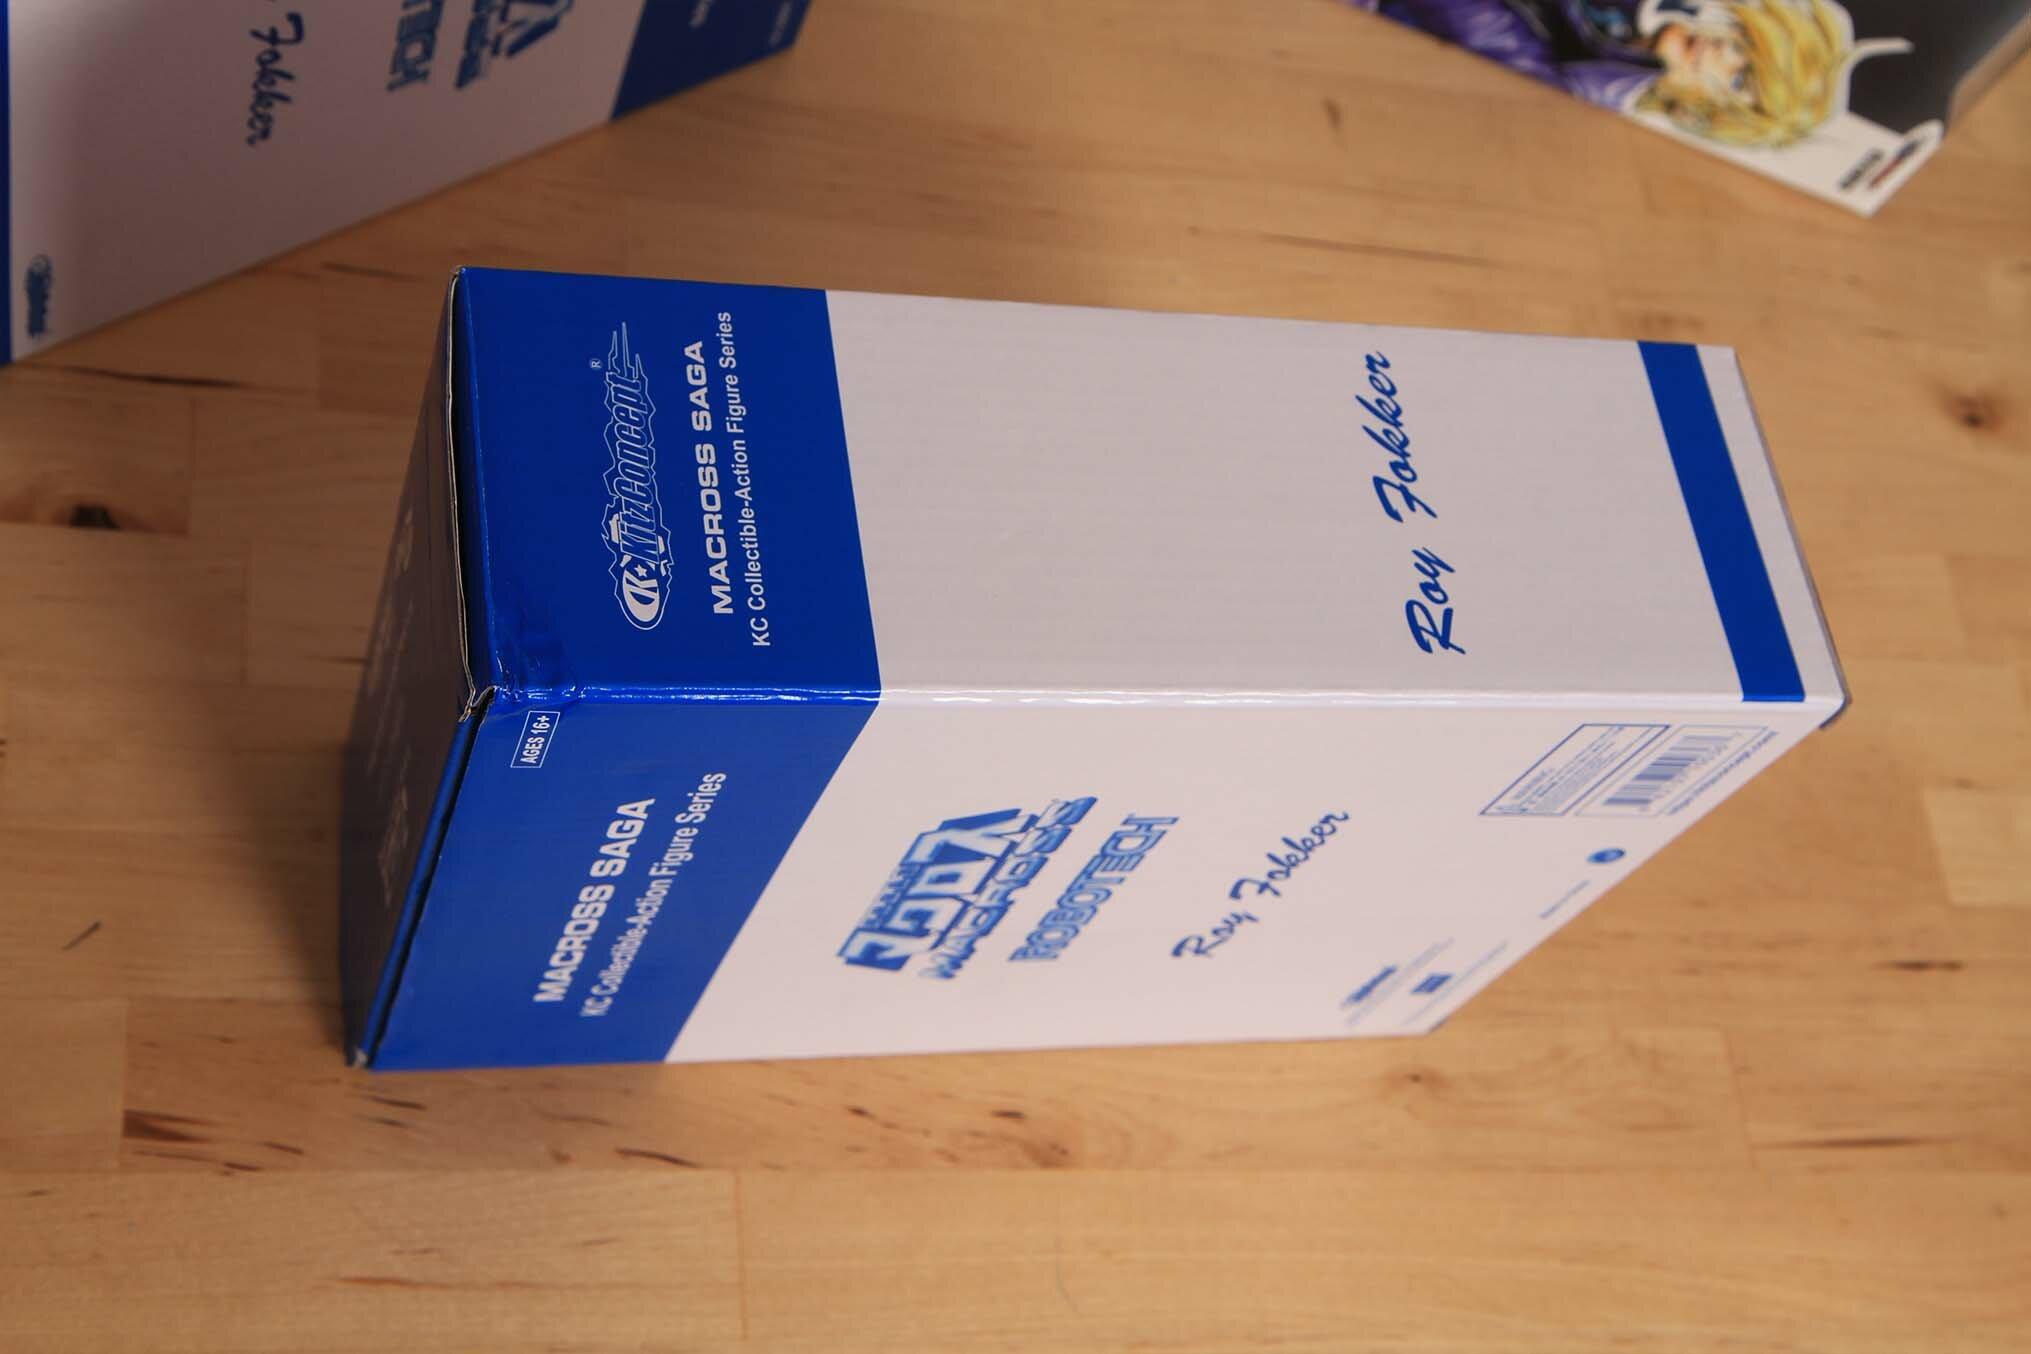 487017384_Box2corner.jpg.5bacaa45e23542308b3659ad00ef0684.jpg